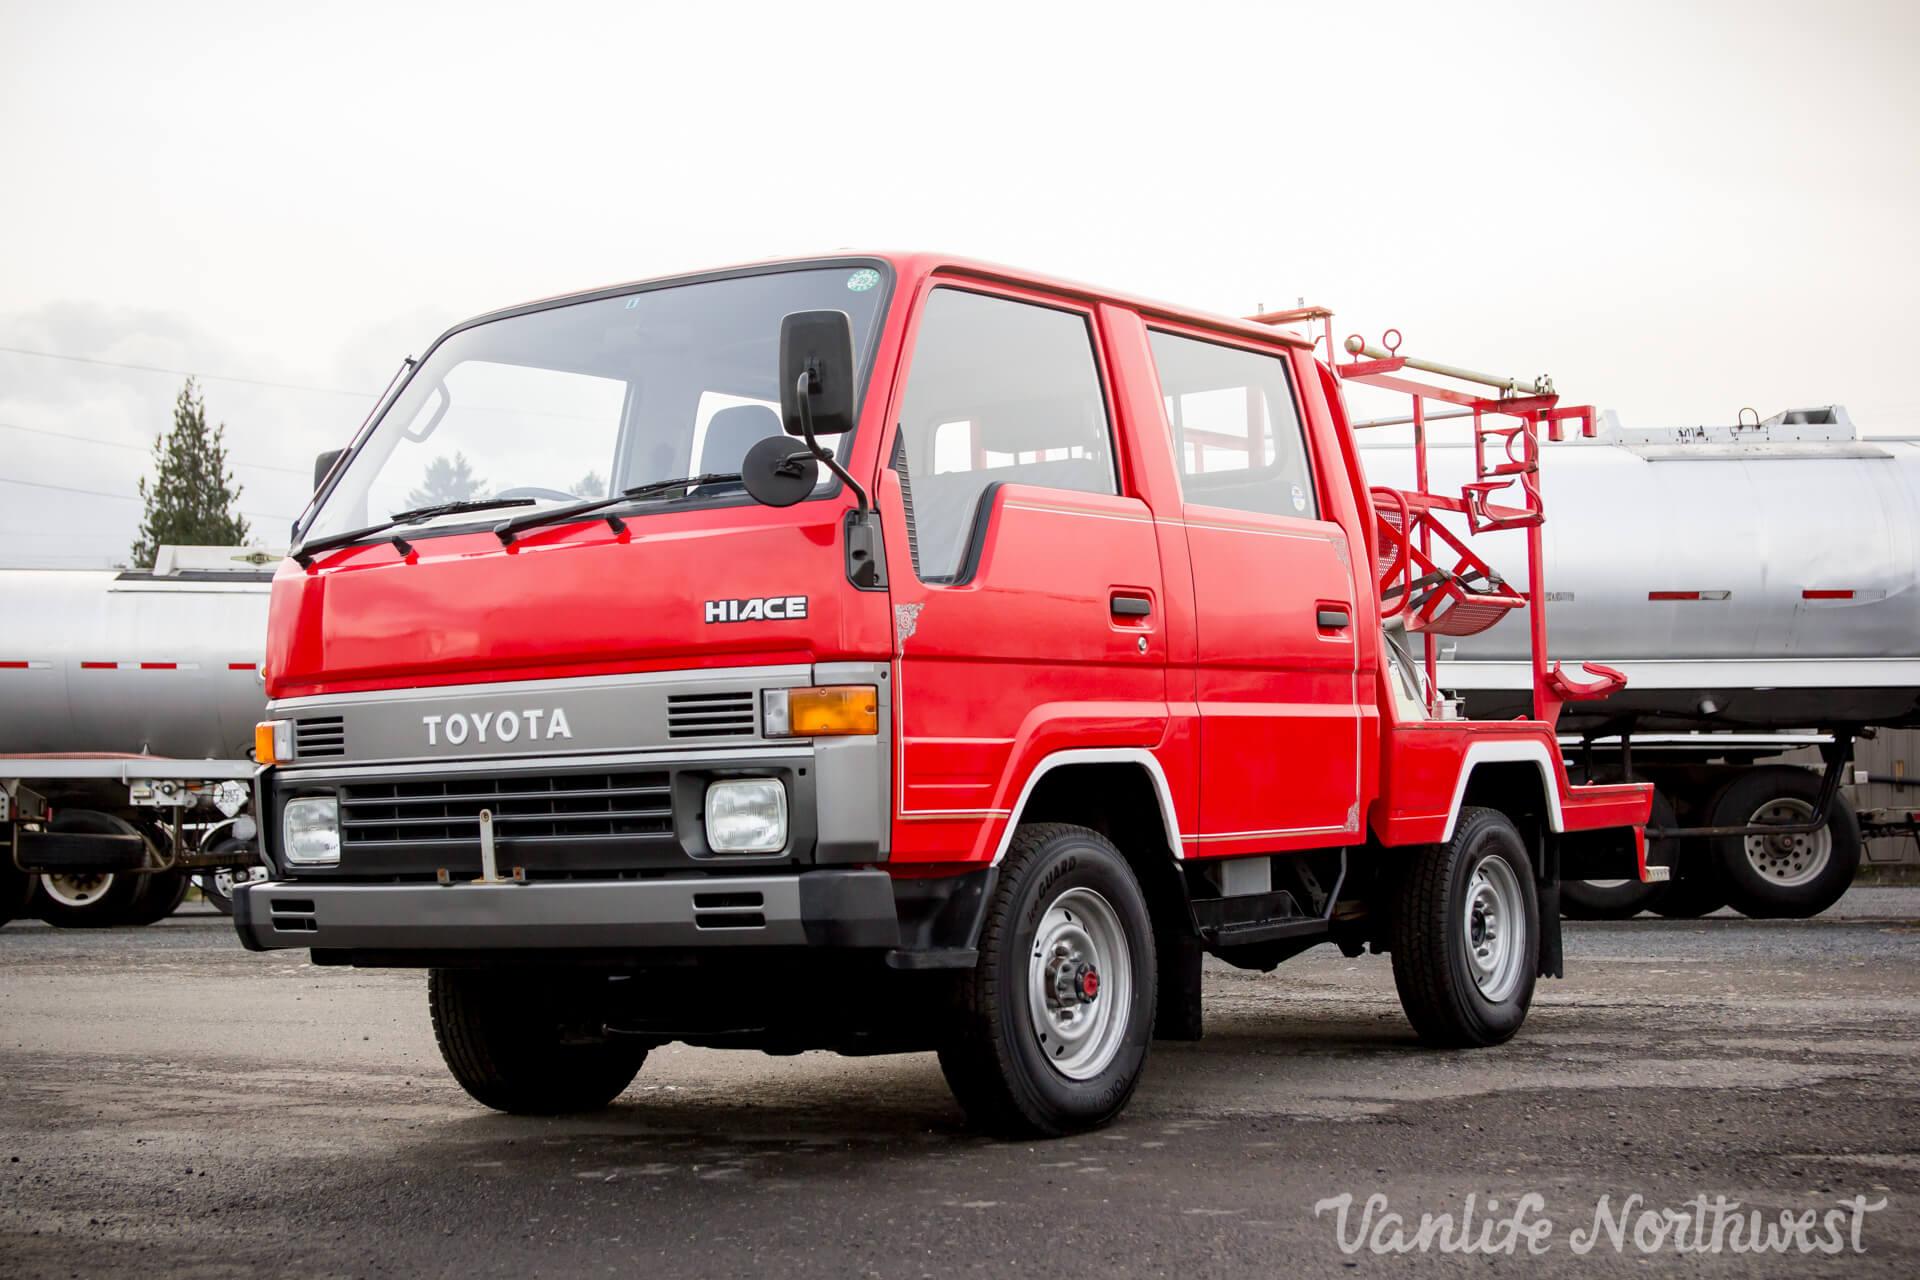 ToyotaHiaceFireTruckLH851990-8.jpg